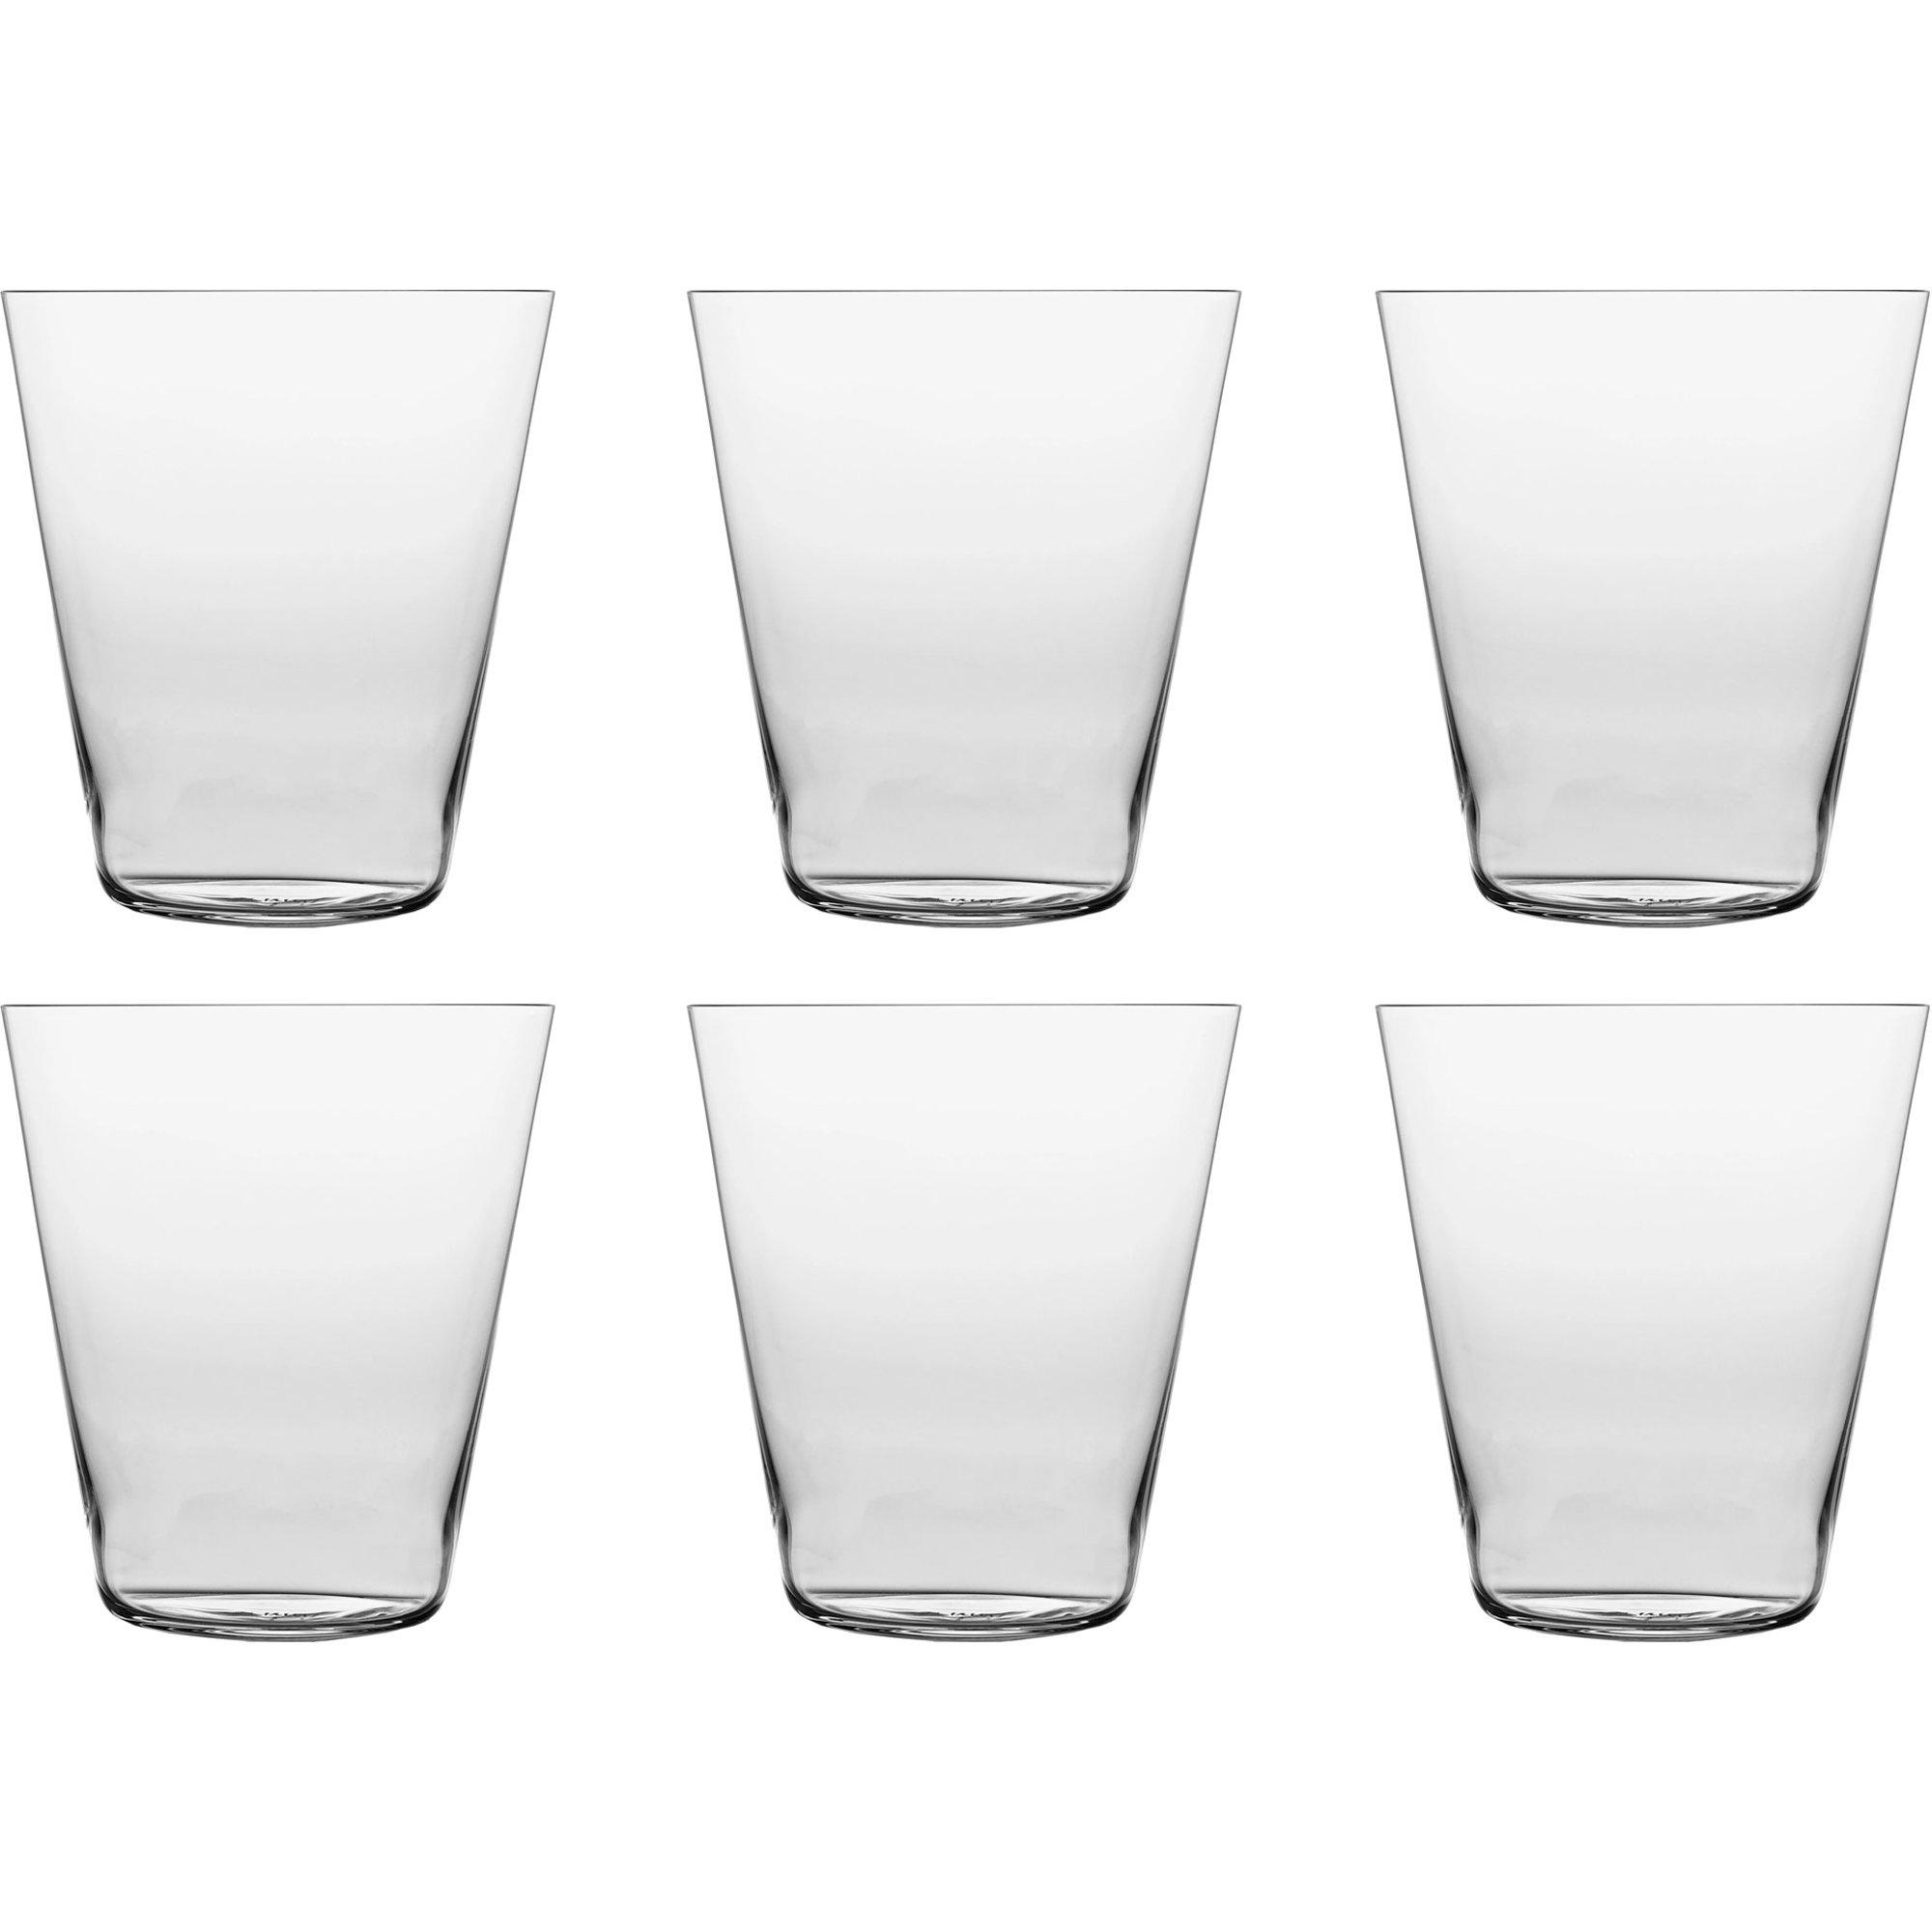 Zalto Coupe Crystal Clear vattenglas 380 ml. 6 st.